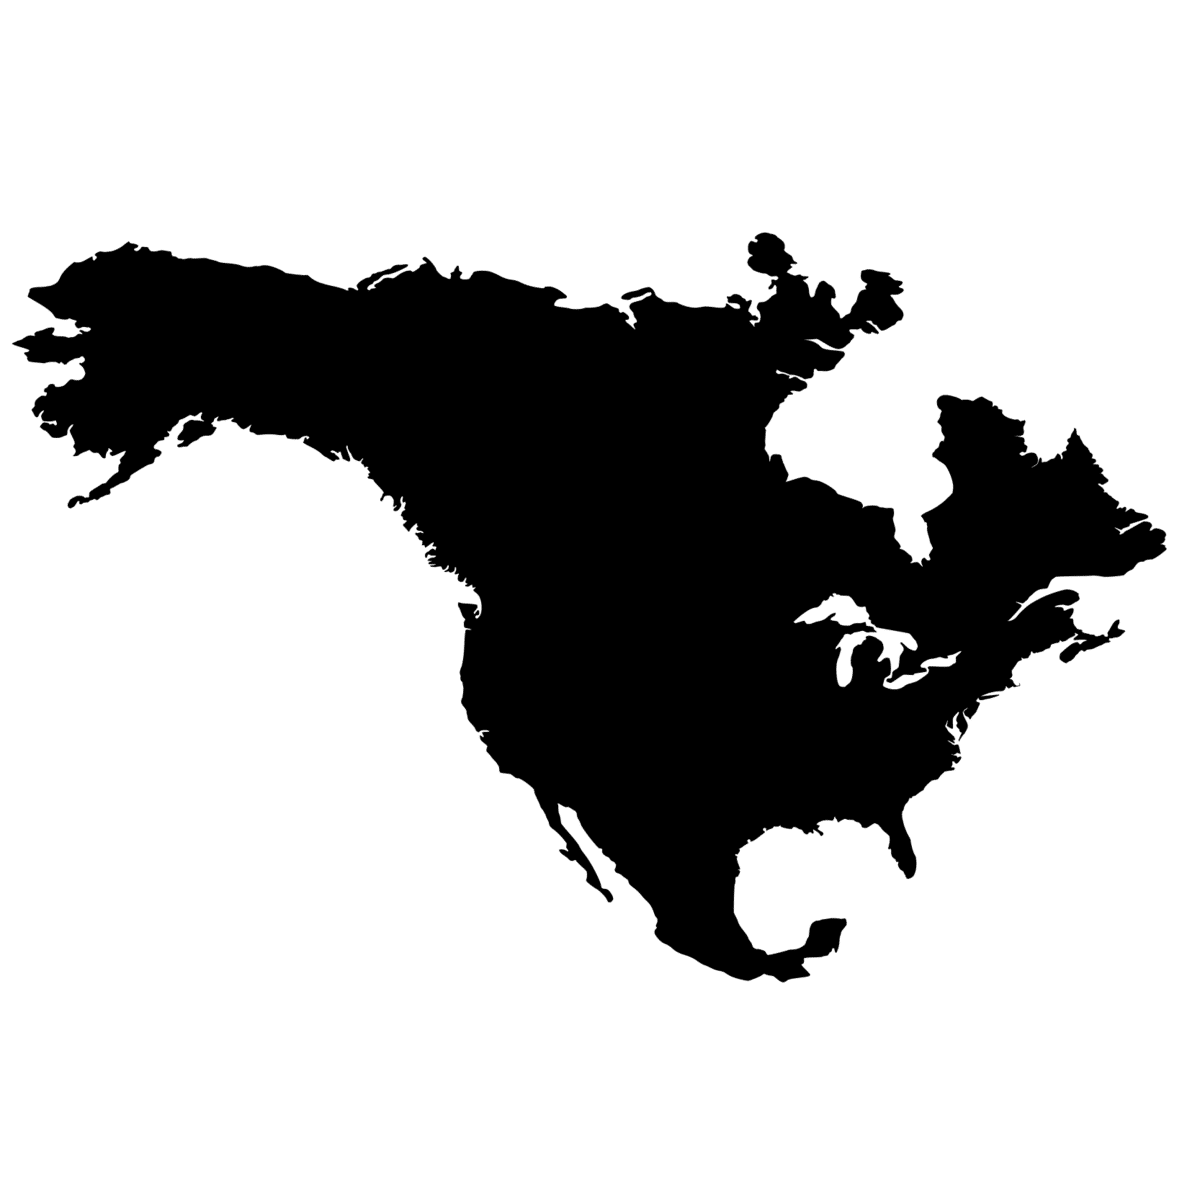 Kuzey Amerika & EMEA